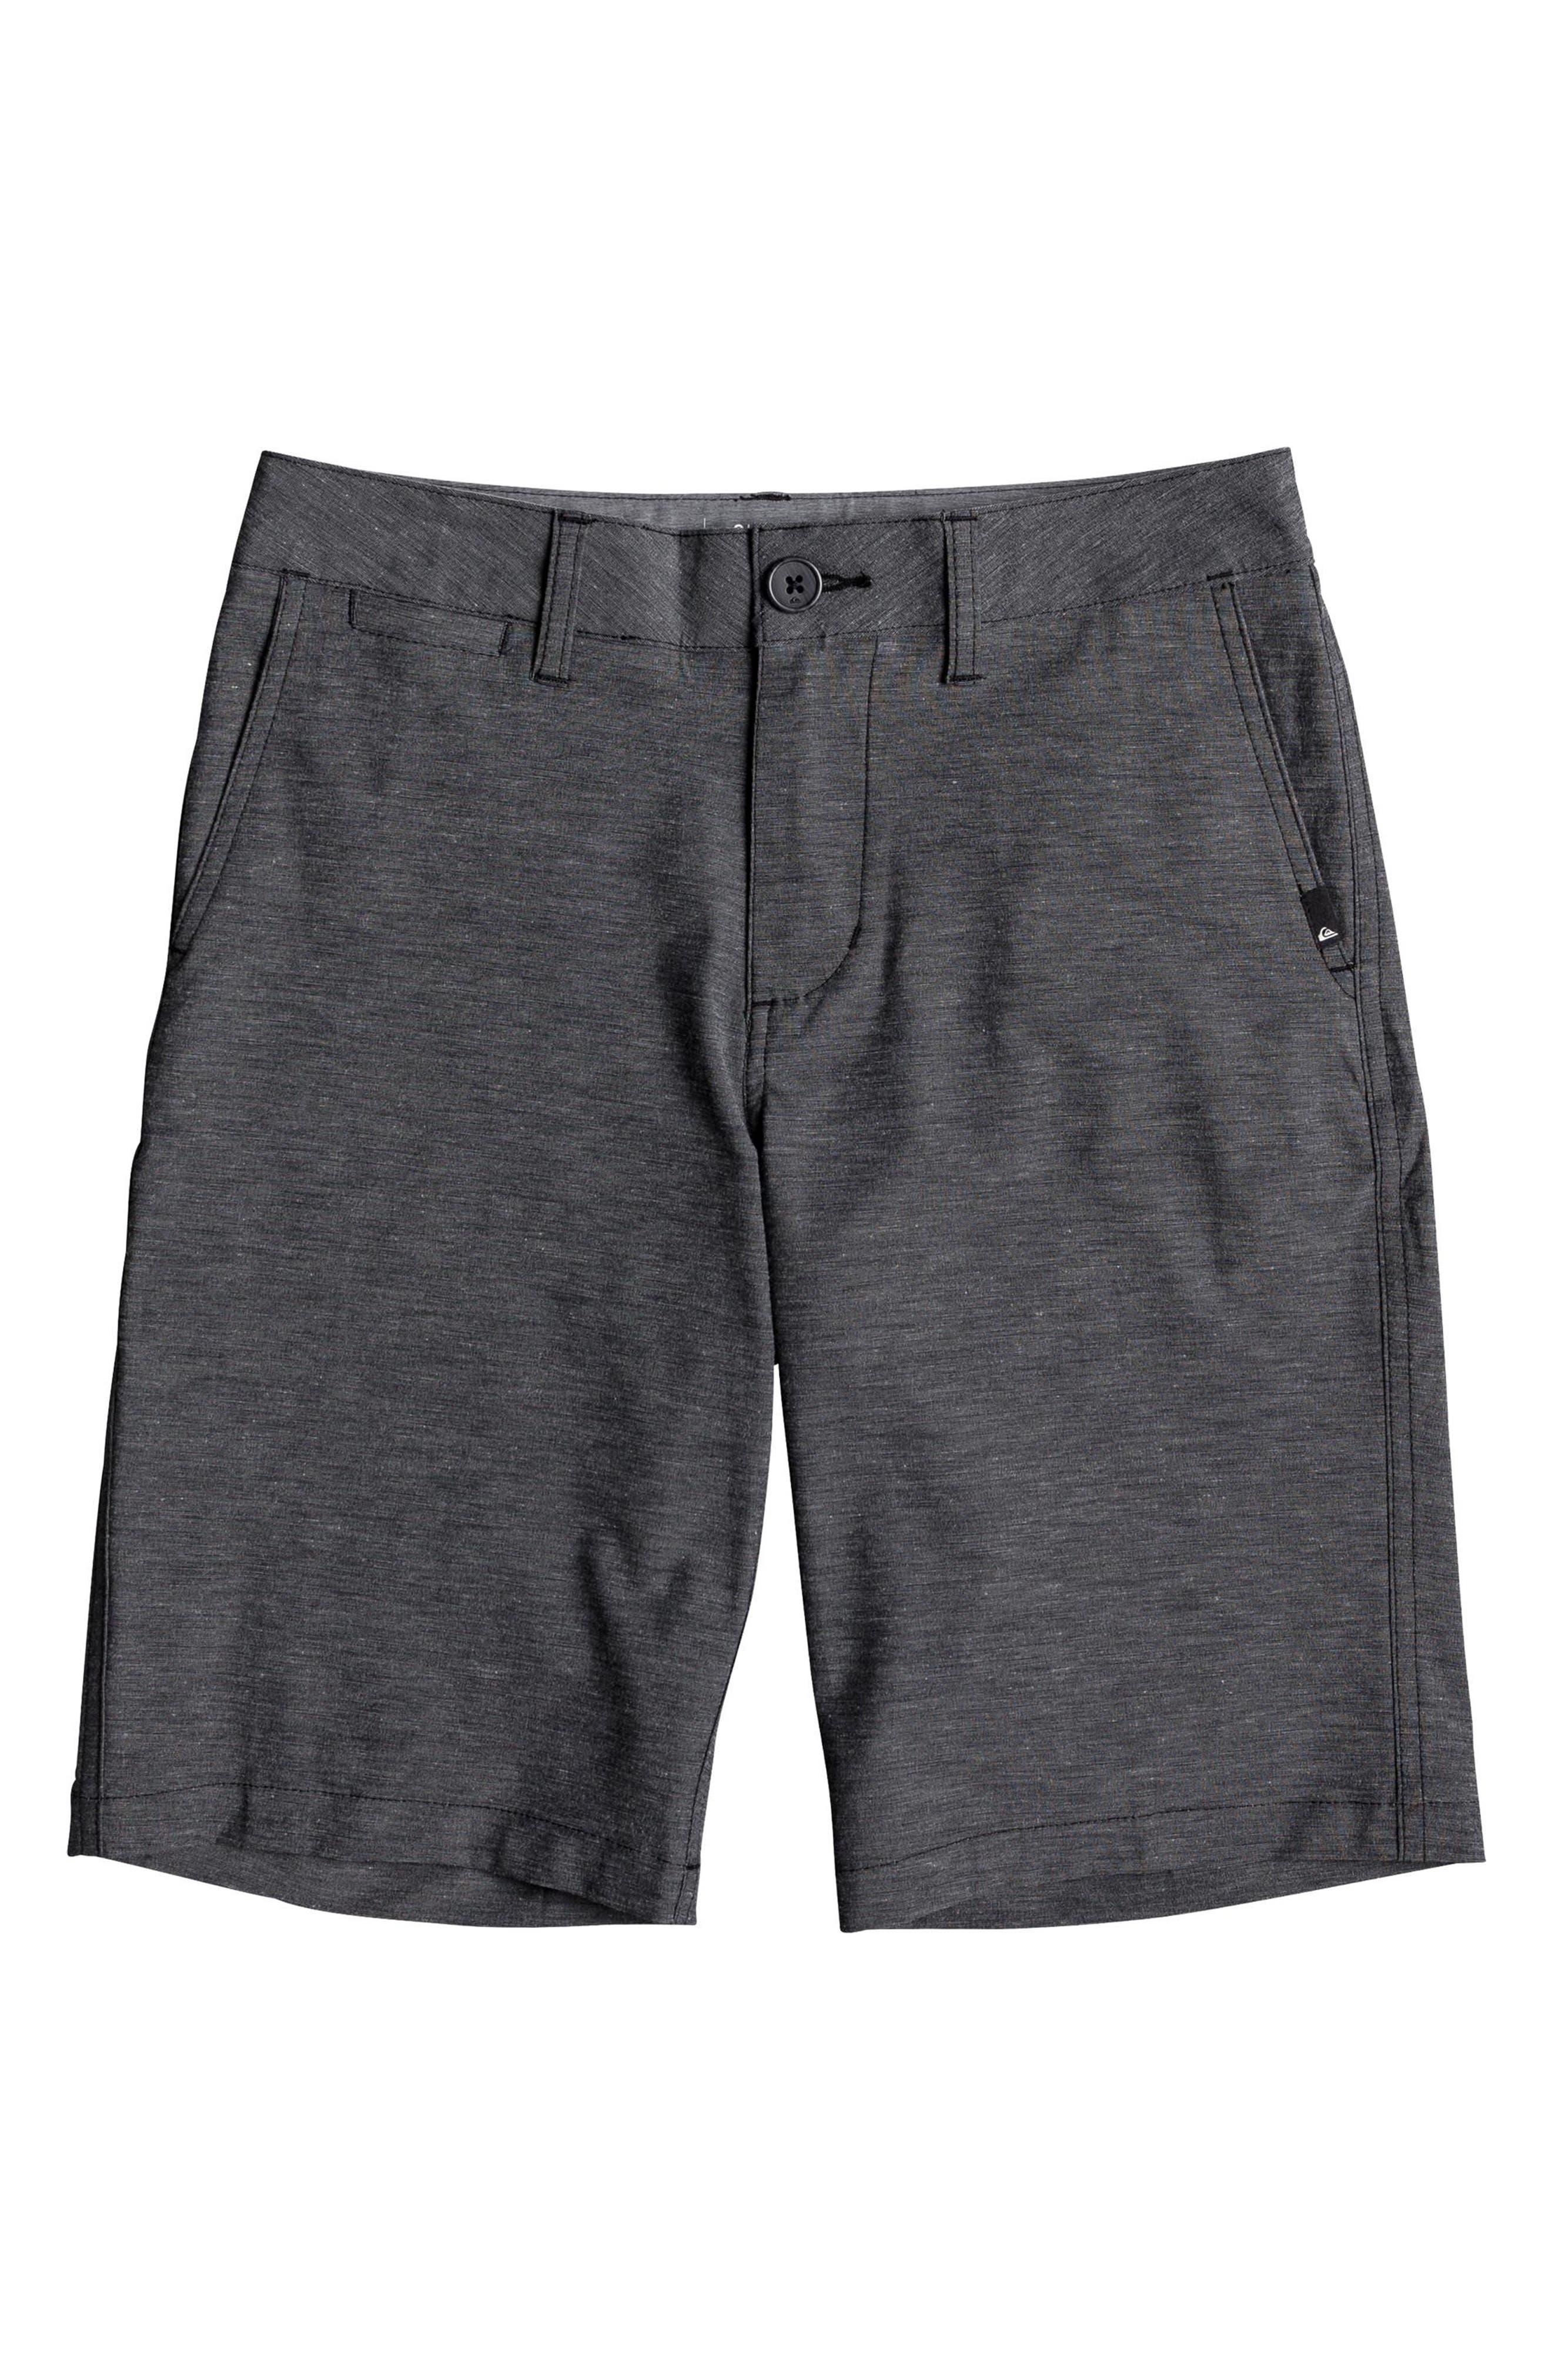 Union Heather Amphibian Hybrid Shorts,                         Main,                         color, BLACK